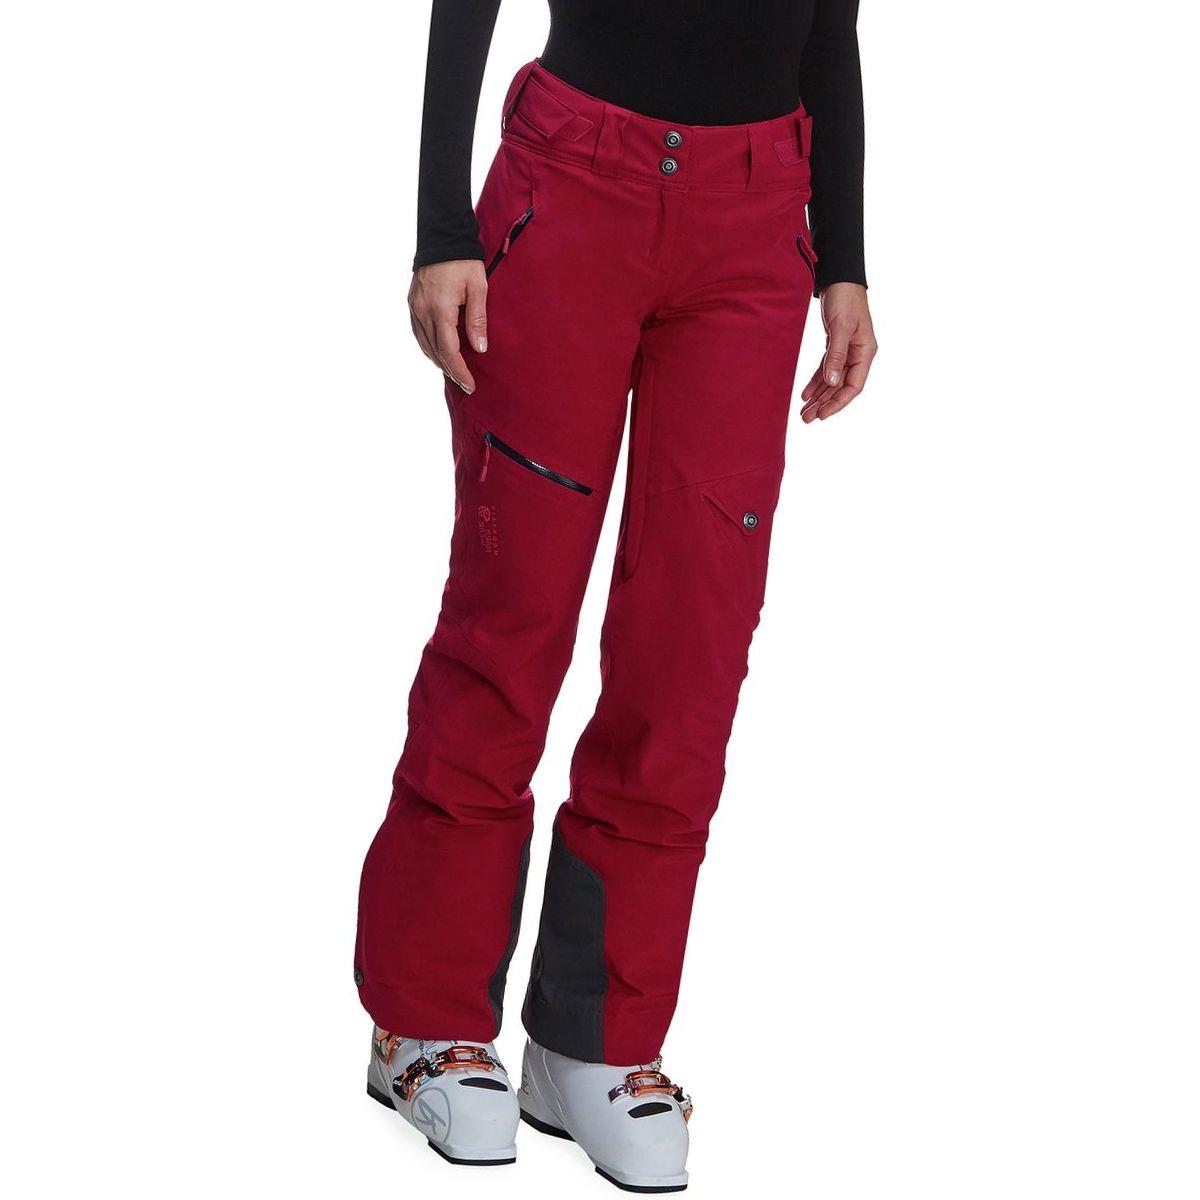 Mountain Hardwear Chute Insulated Pant - Women's